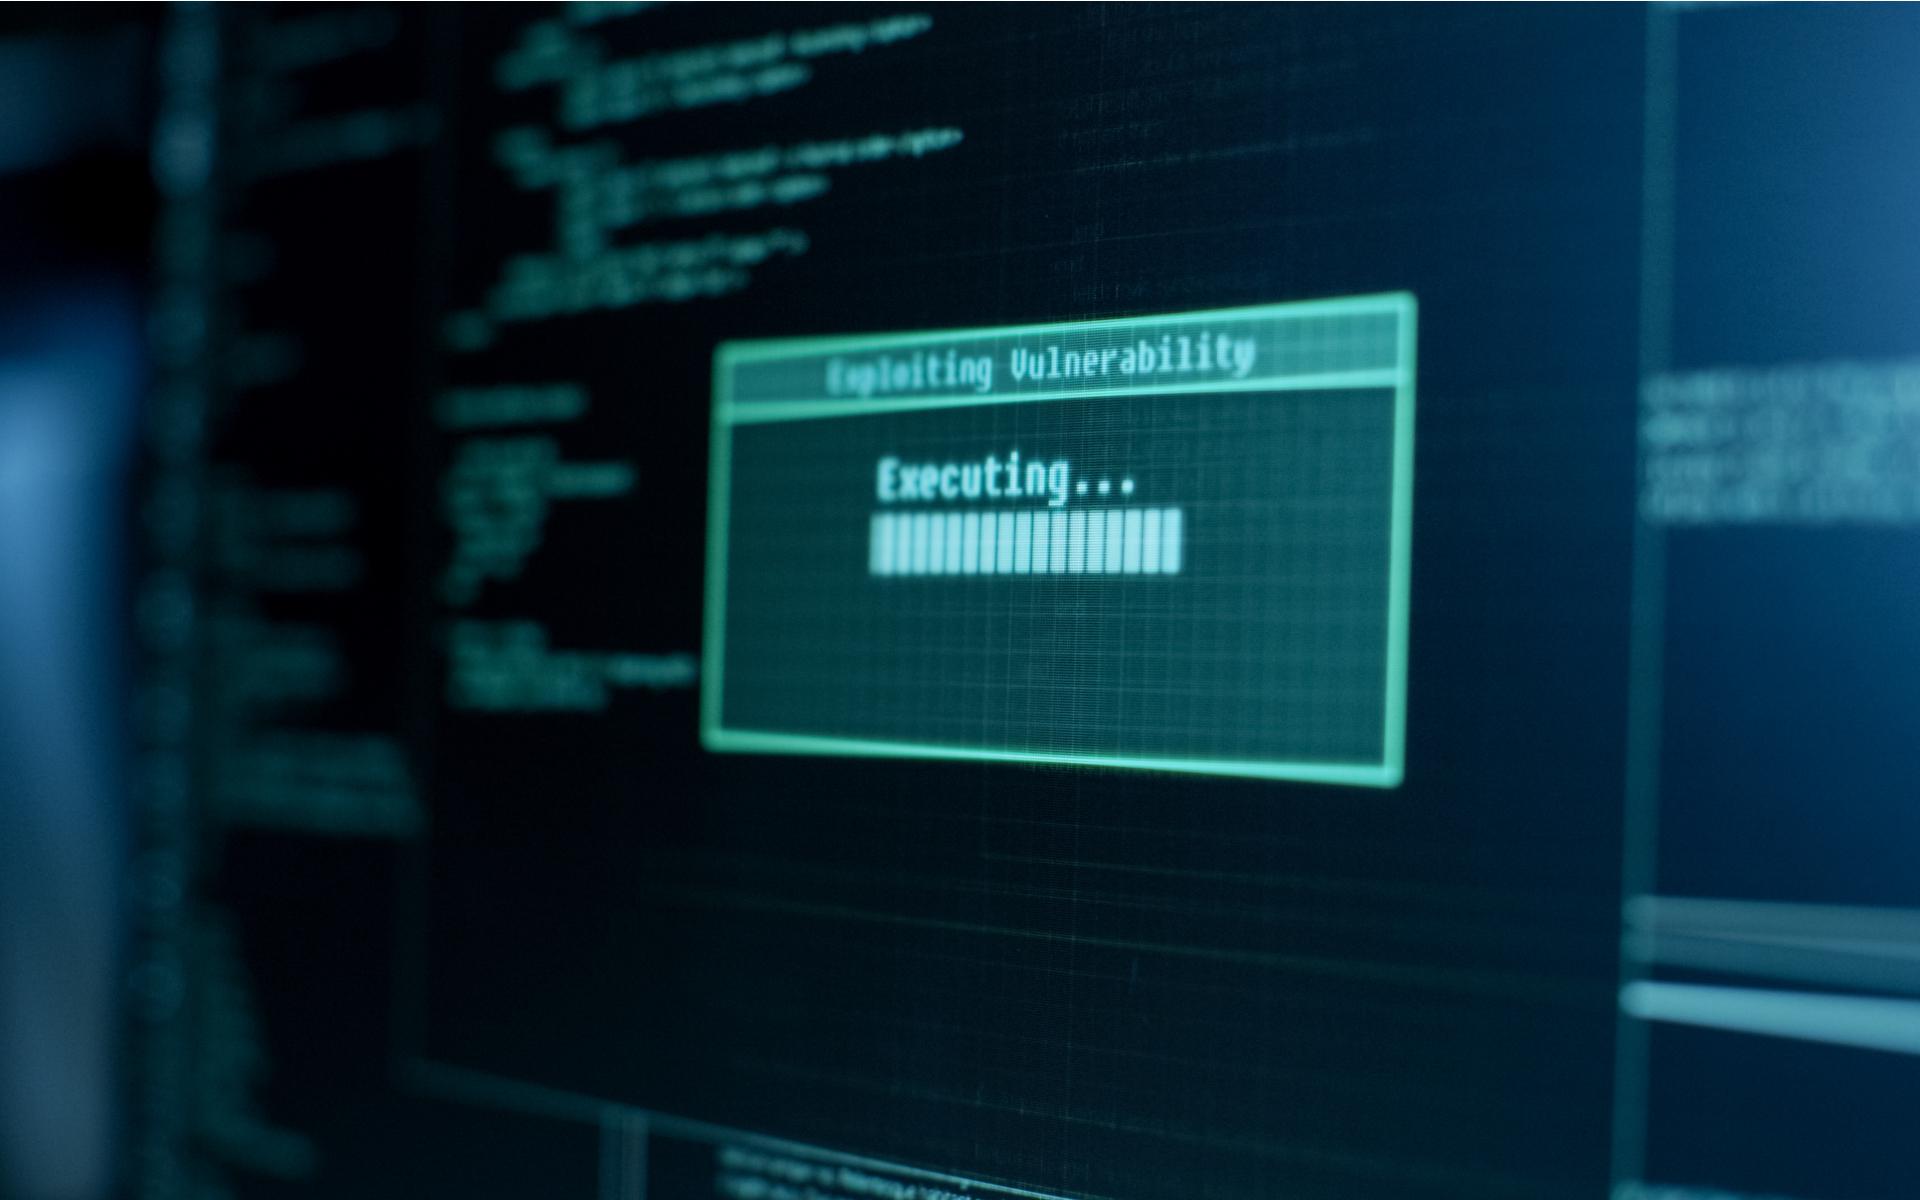 mimblewimble hacked for less than $60 on AWS